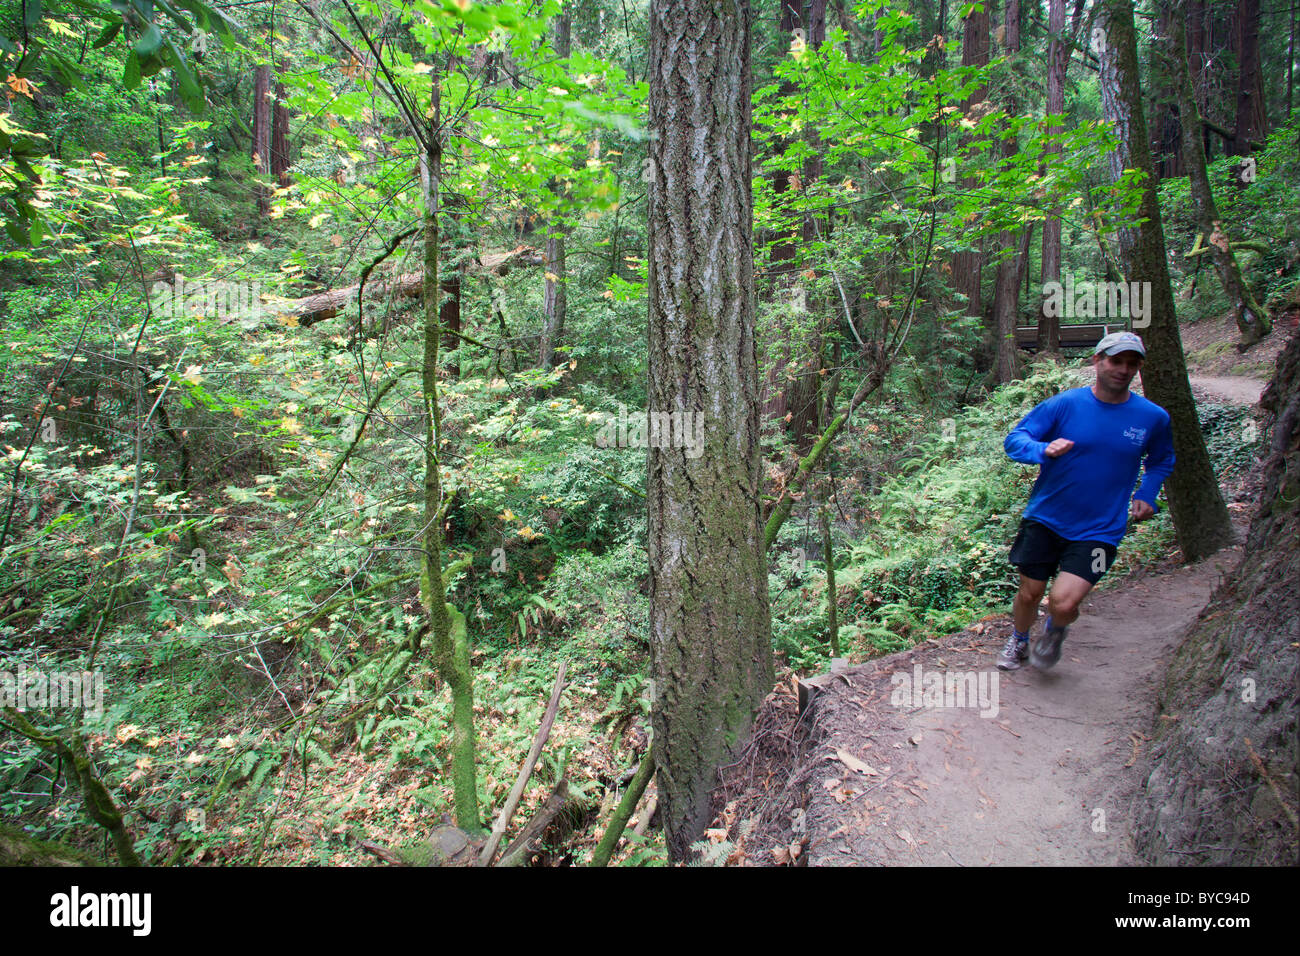 Trail running in The Forest of Nisene Marks State Park, Aptos, California - Stock Image